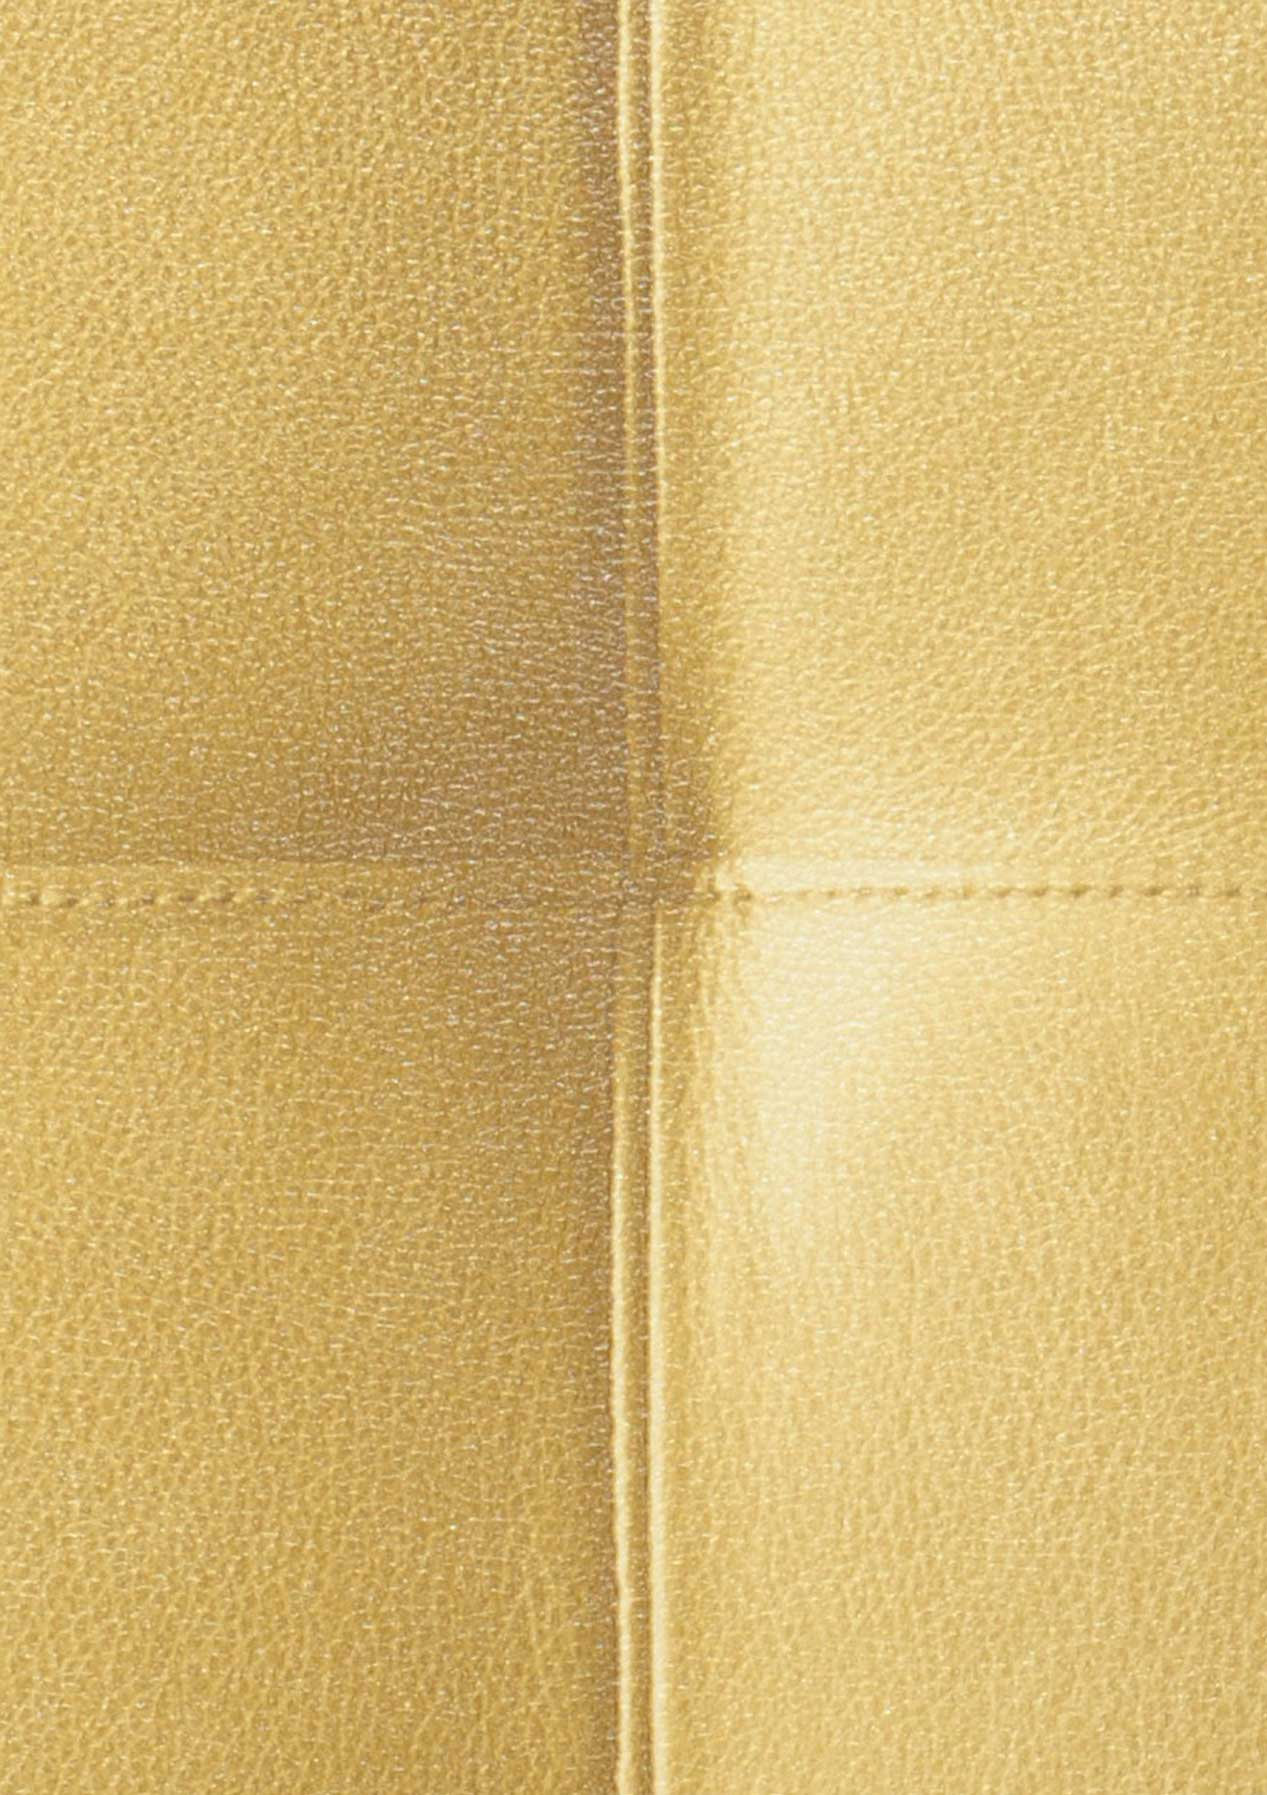 Kadmos jaune curry vert marron jaune curry vert marron for Papier peint cuir marron